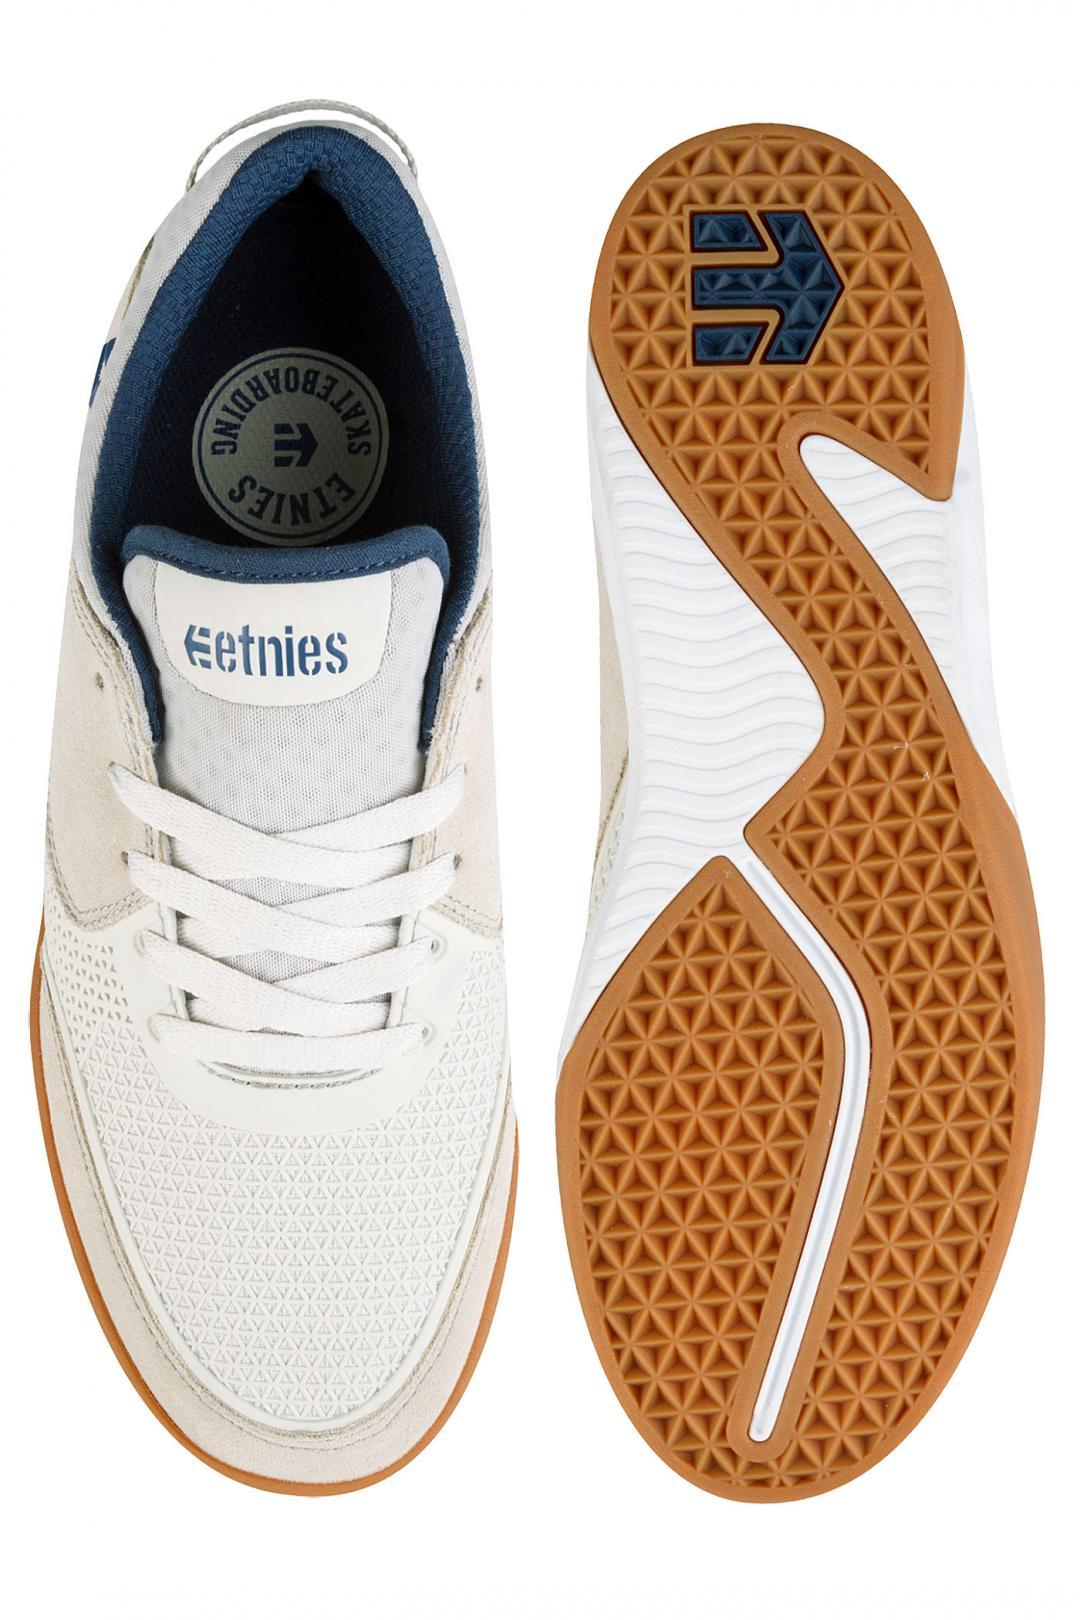 Uomo Etnies Helix white navy gum | Sneaker